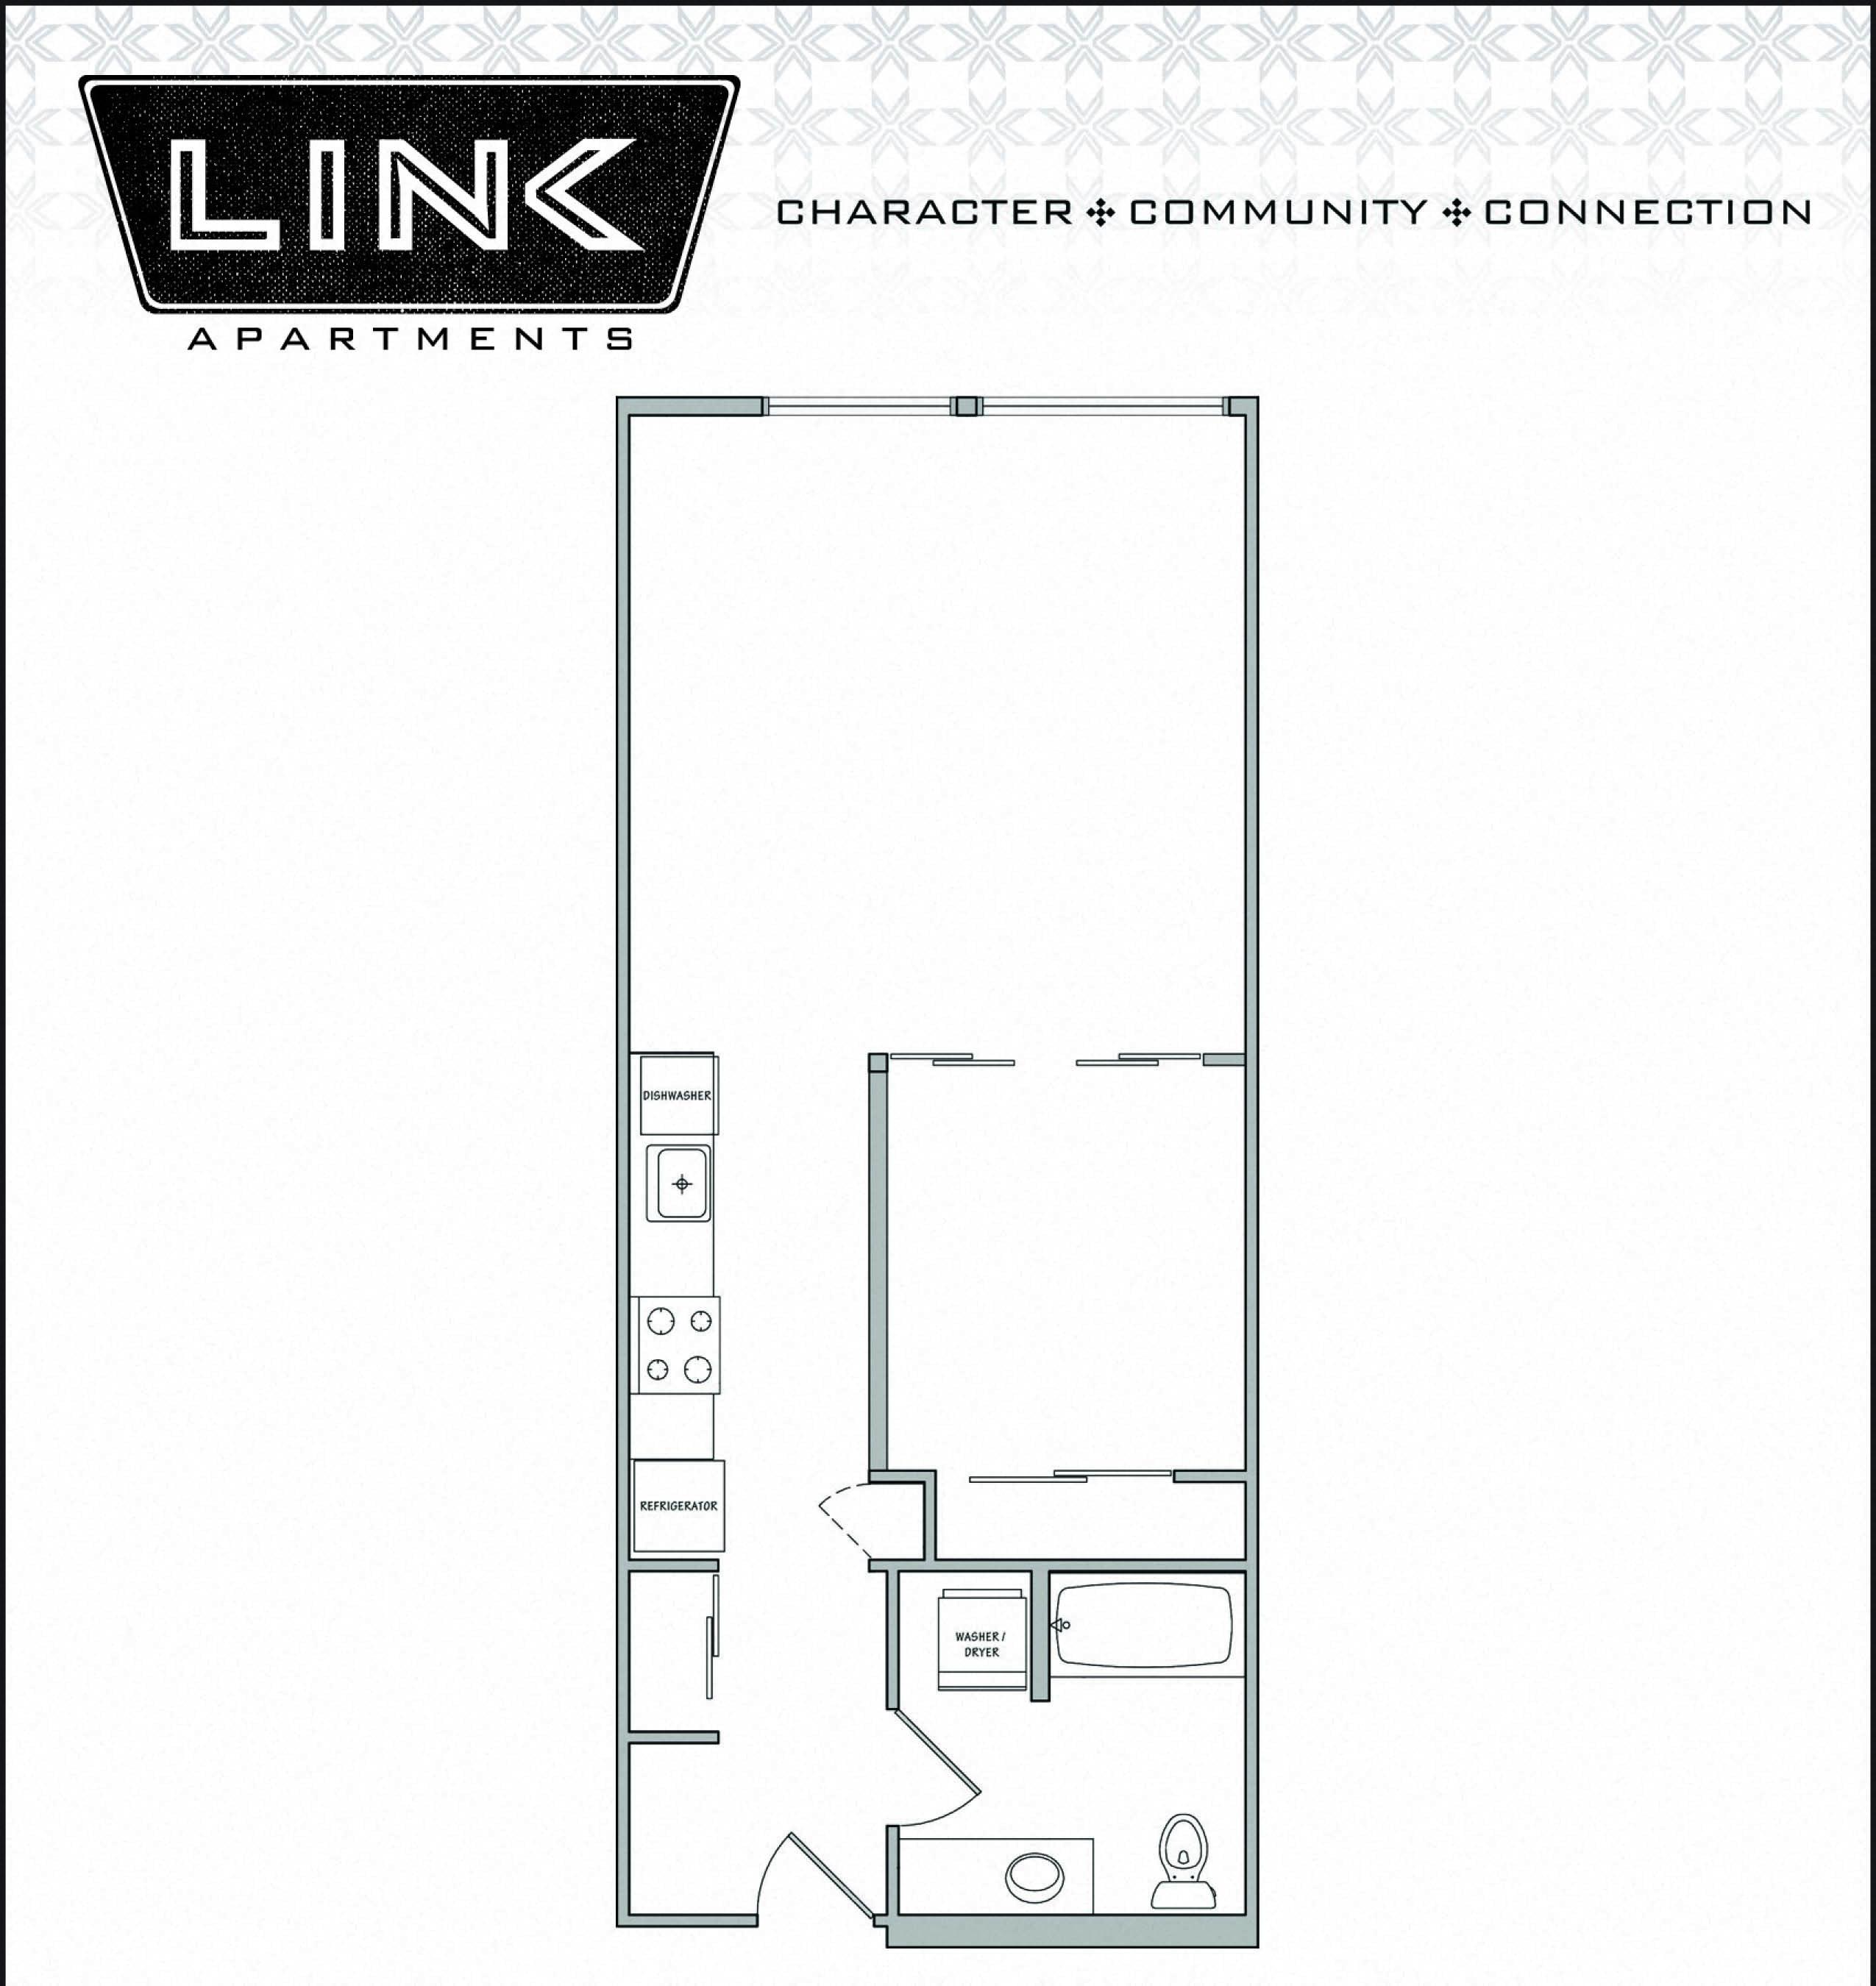 Floorplan at Link Apartment Homes, Seattle, Washington